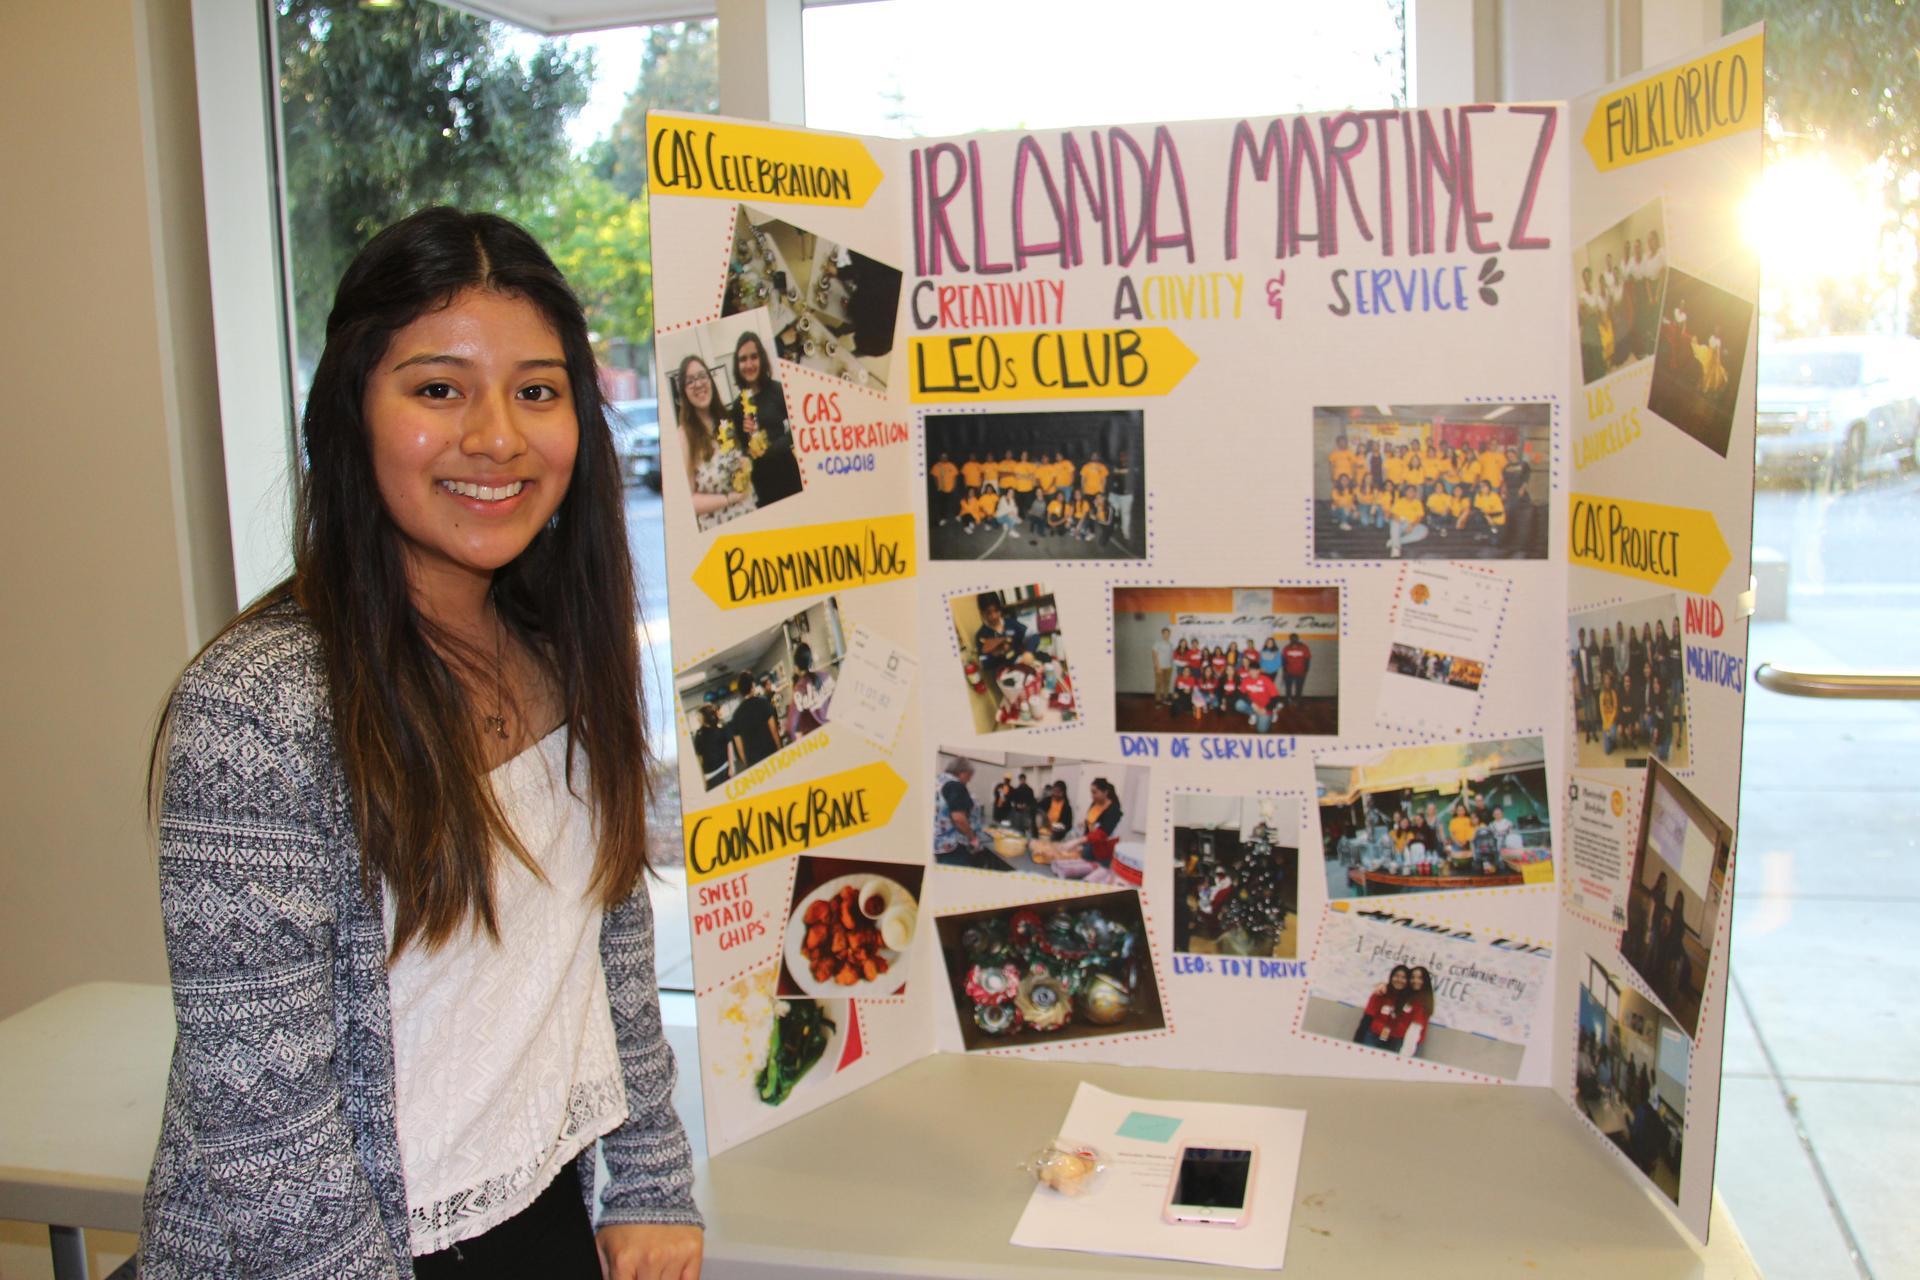 Image of IB Student - Irlanda - showcasing her Creativity, Activity & Service experiences